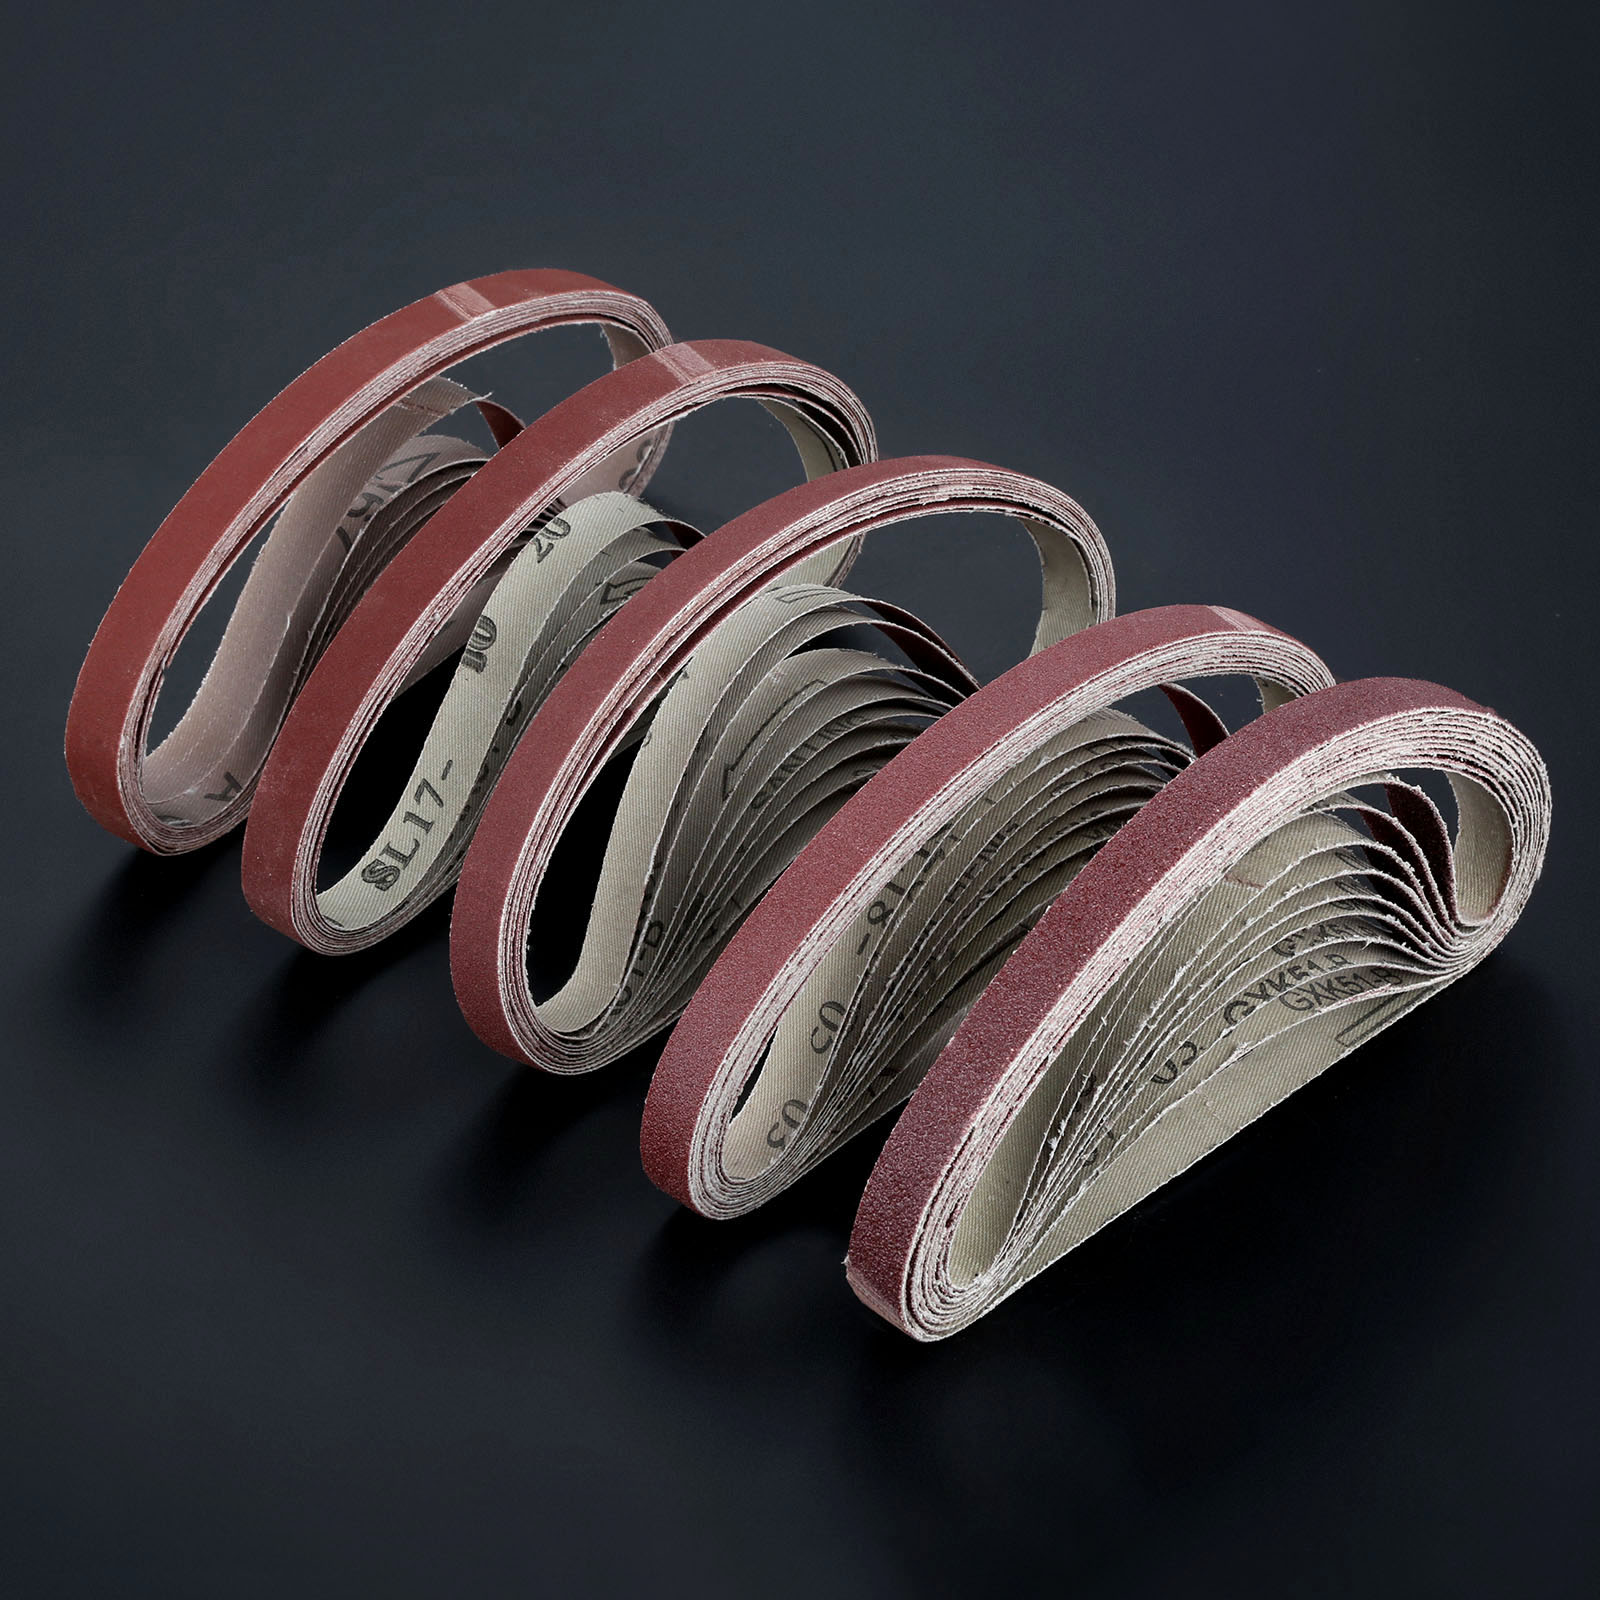 10Pcs/set 60 To 600 Grit 15mm X 452mm Sanding Belts For Angle Grinder Sanding Belt Adapter Polishing Sanding Grinding